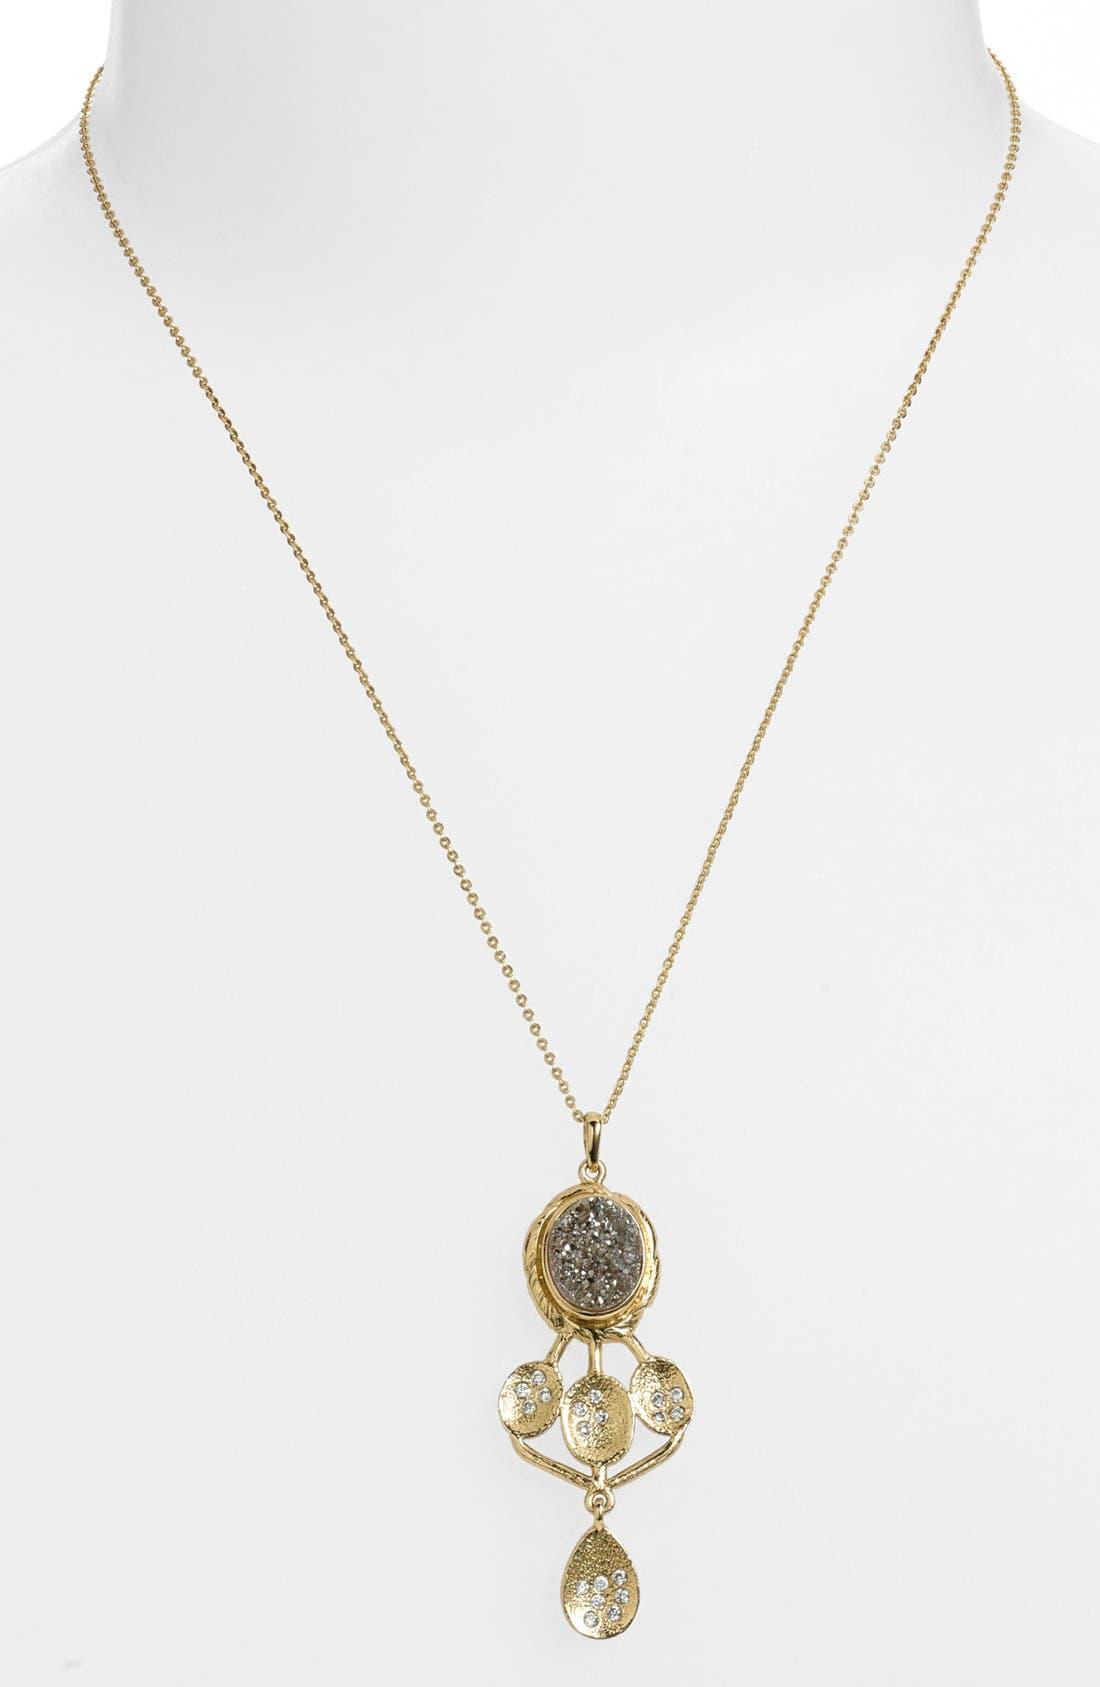 Alternate Image 1 Selected - Melinda Maria 'Julian' Pendant Necklace